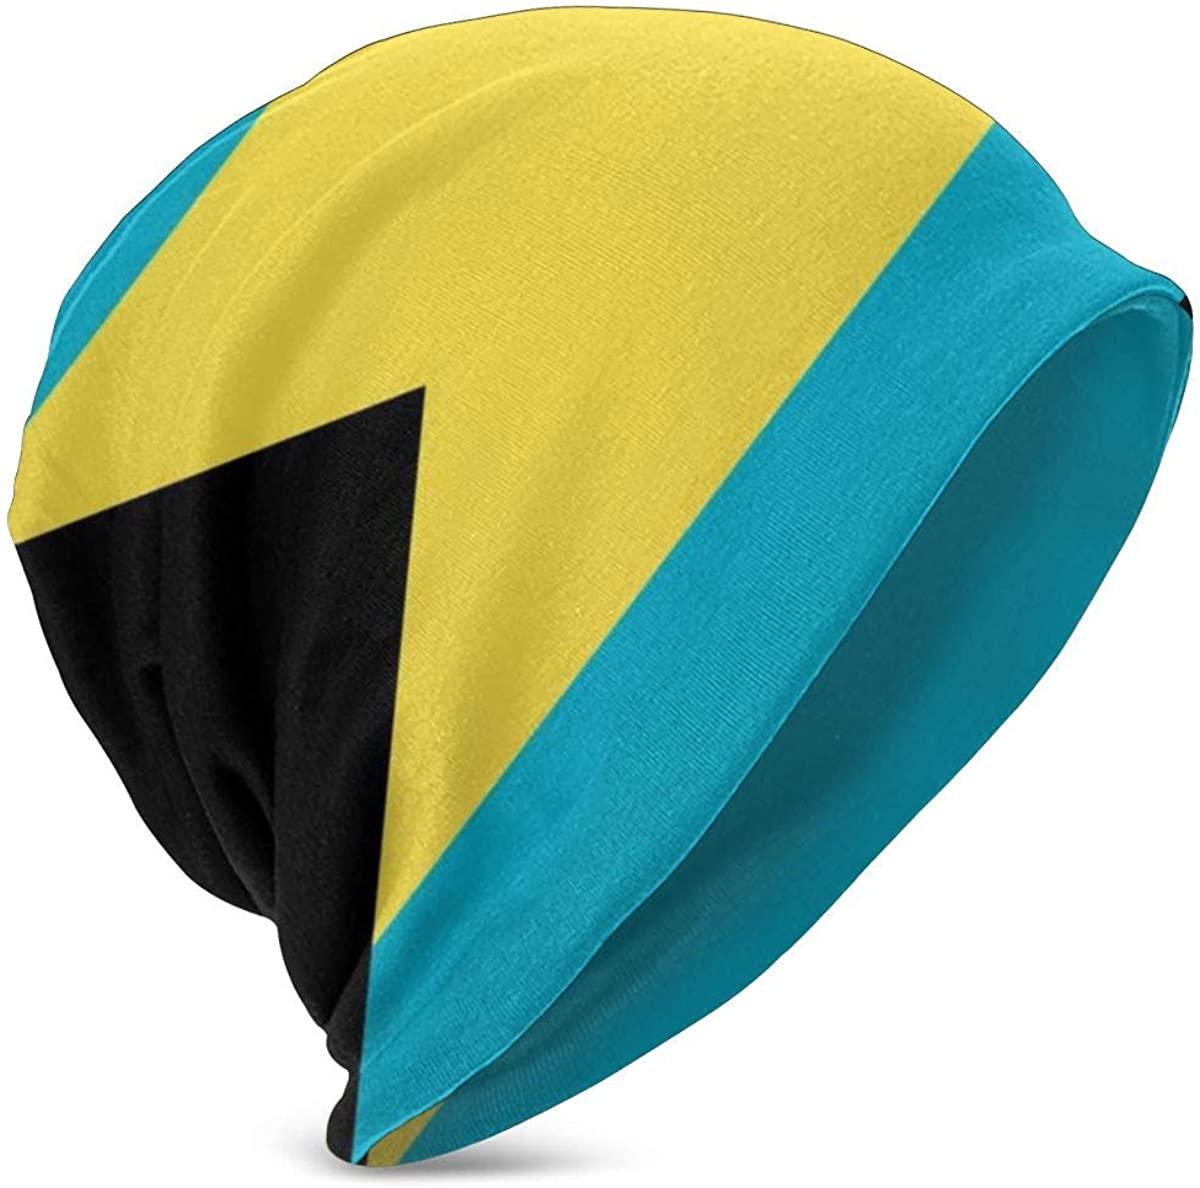 Bahamas Flag Child Warm Winter Hats Premium Slouchy Knit Beanie Cap